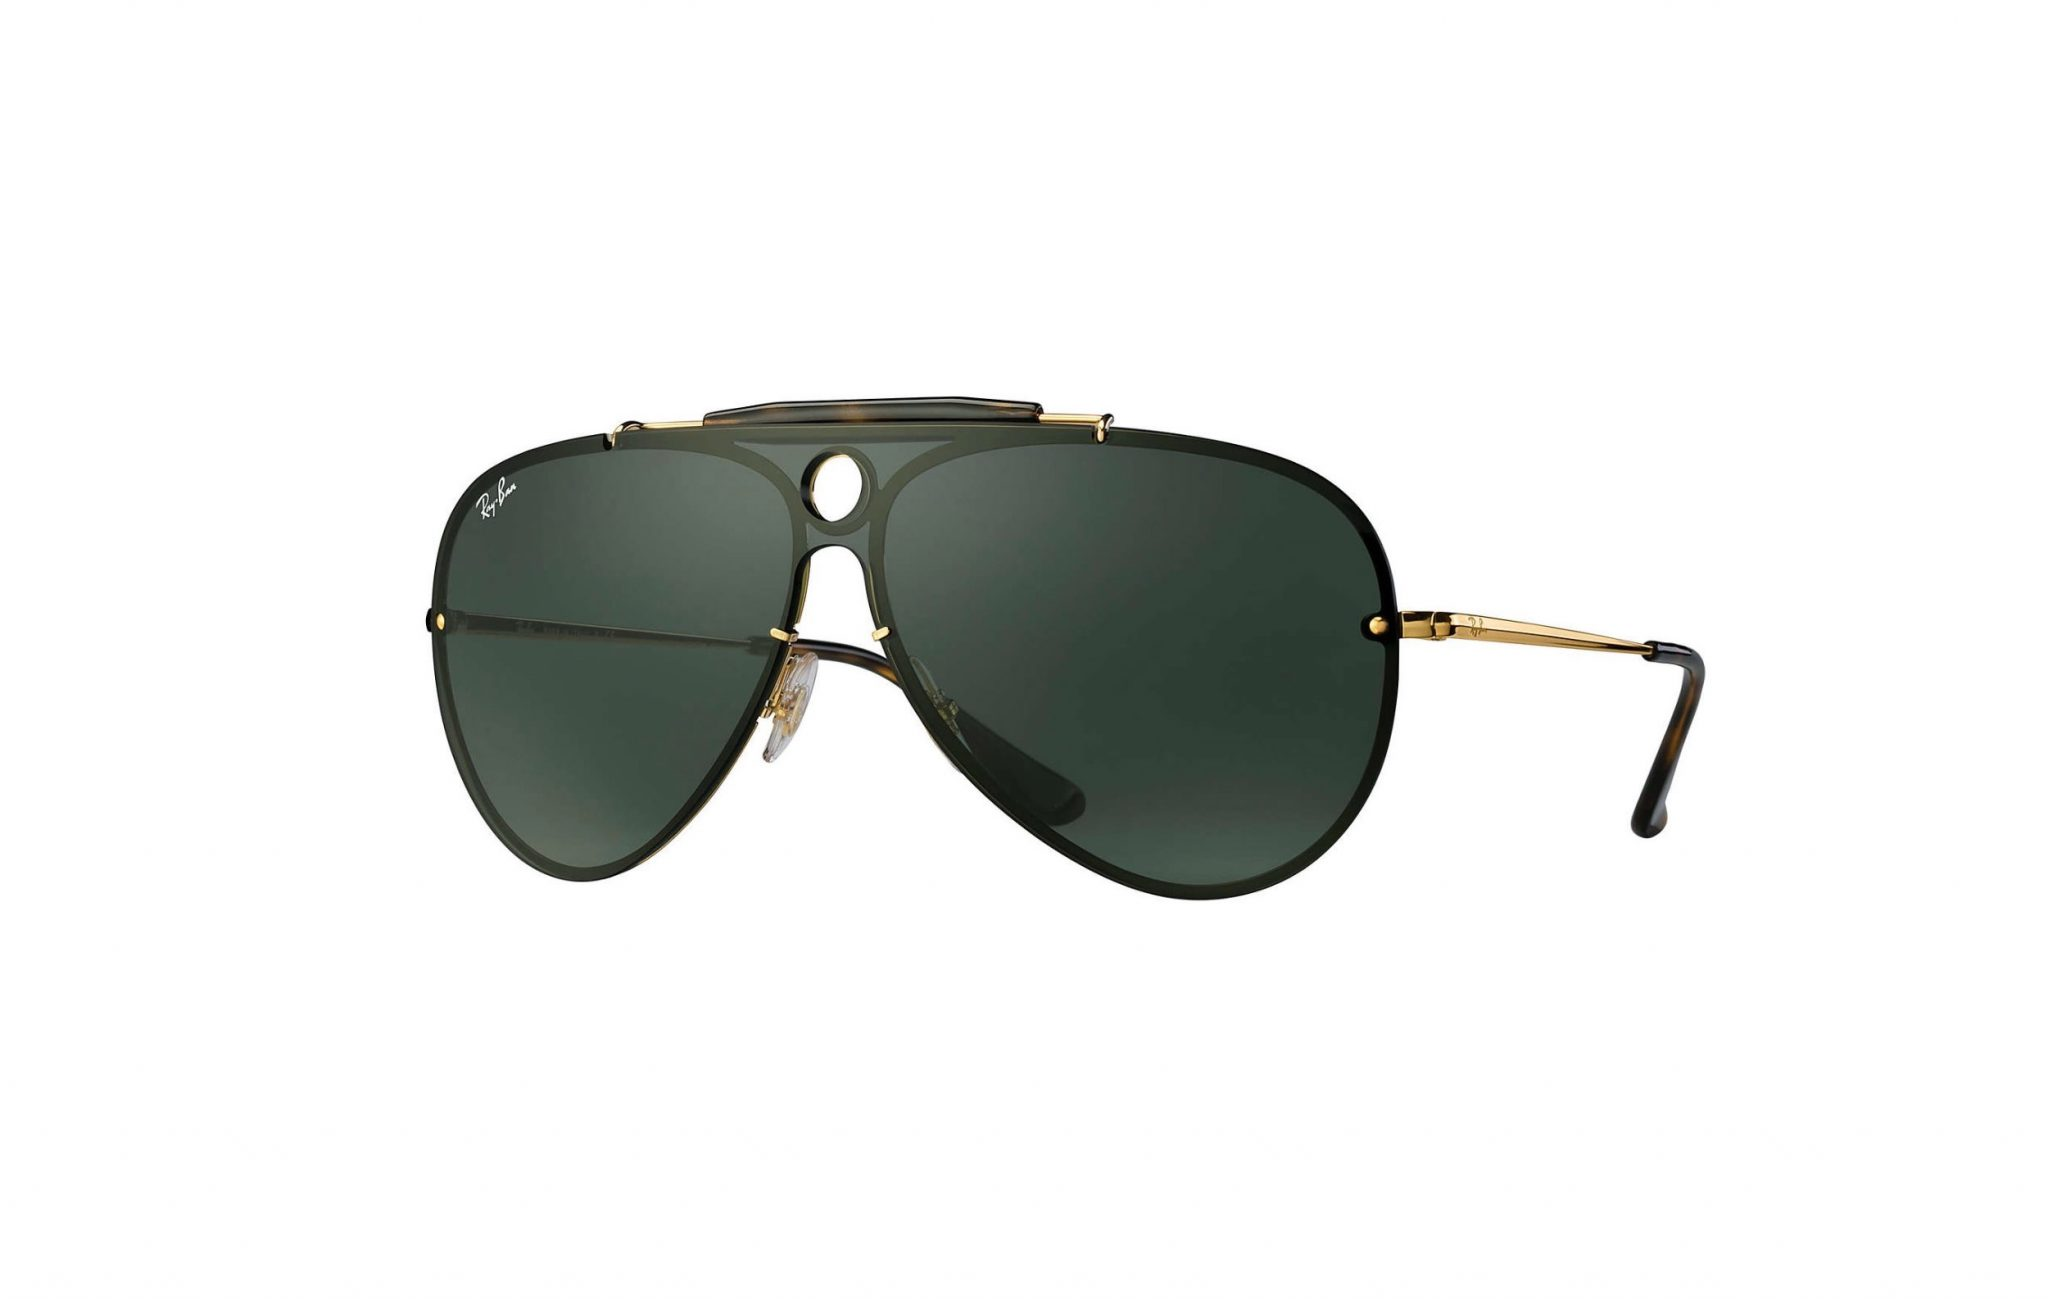 Ray Ban Blaze Shooter Sunglasses